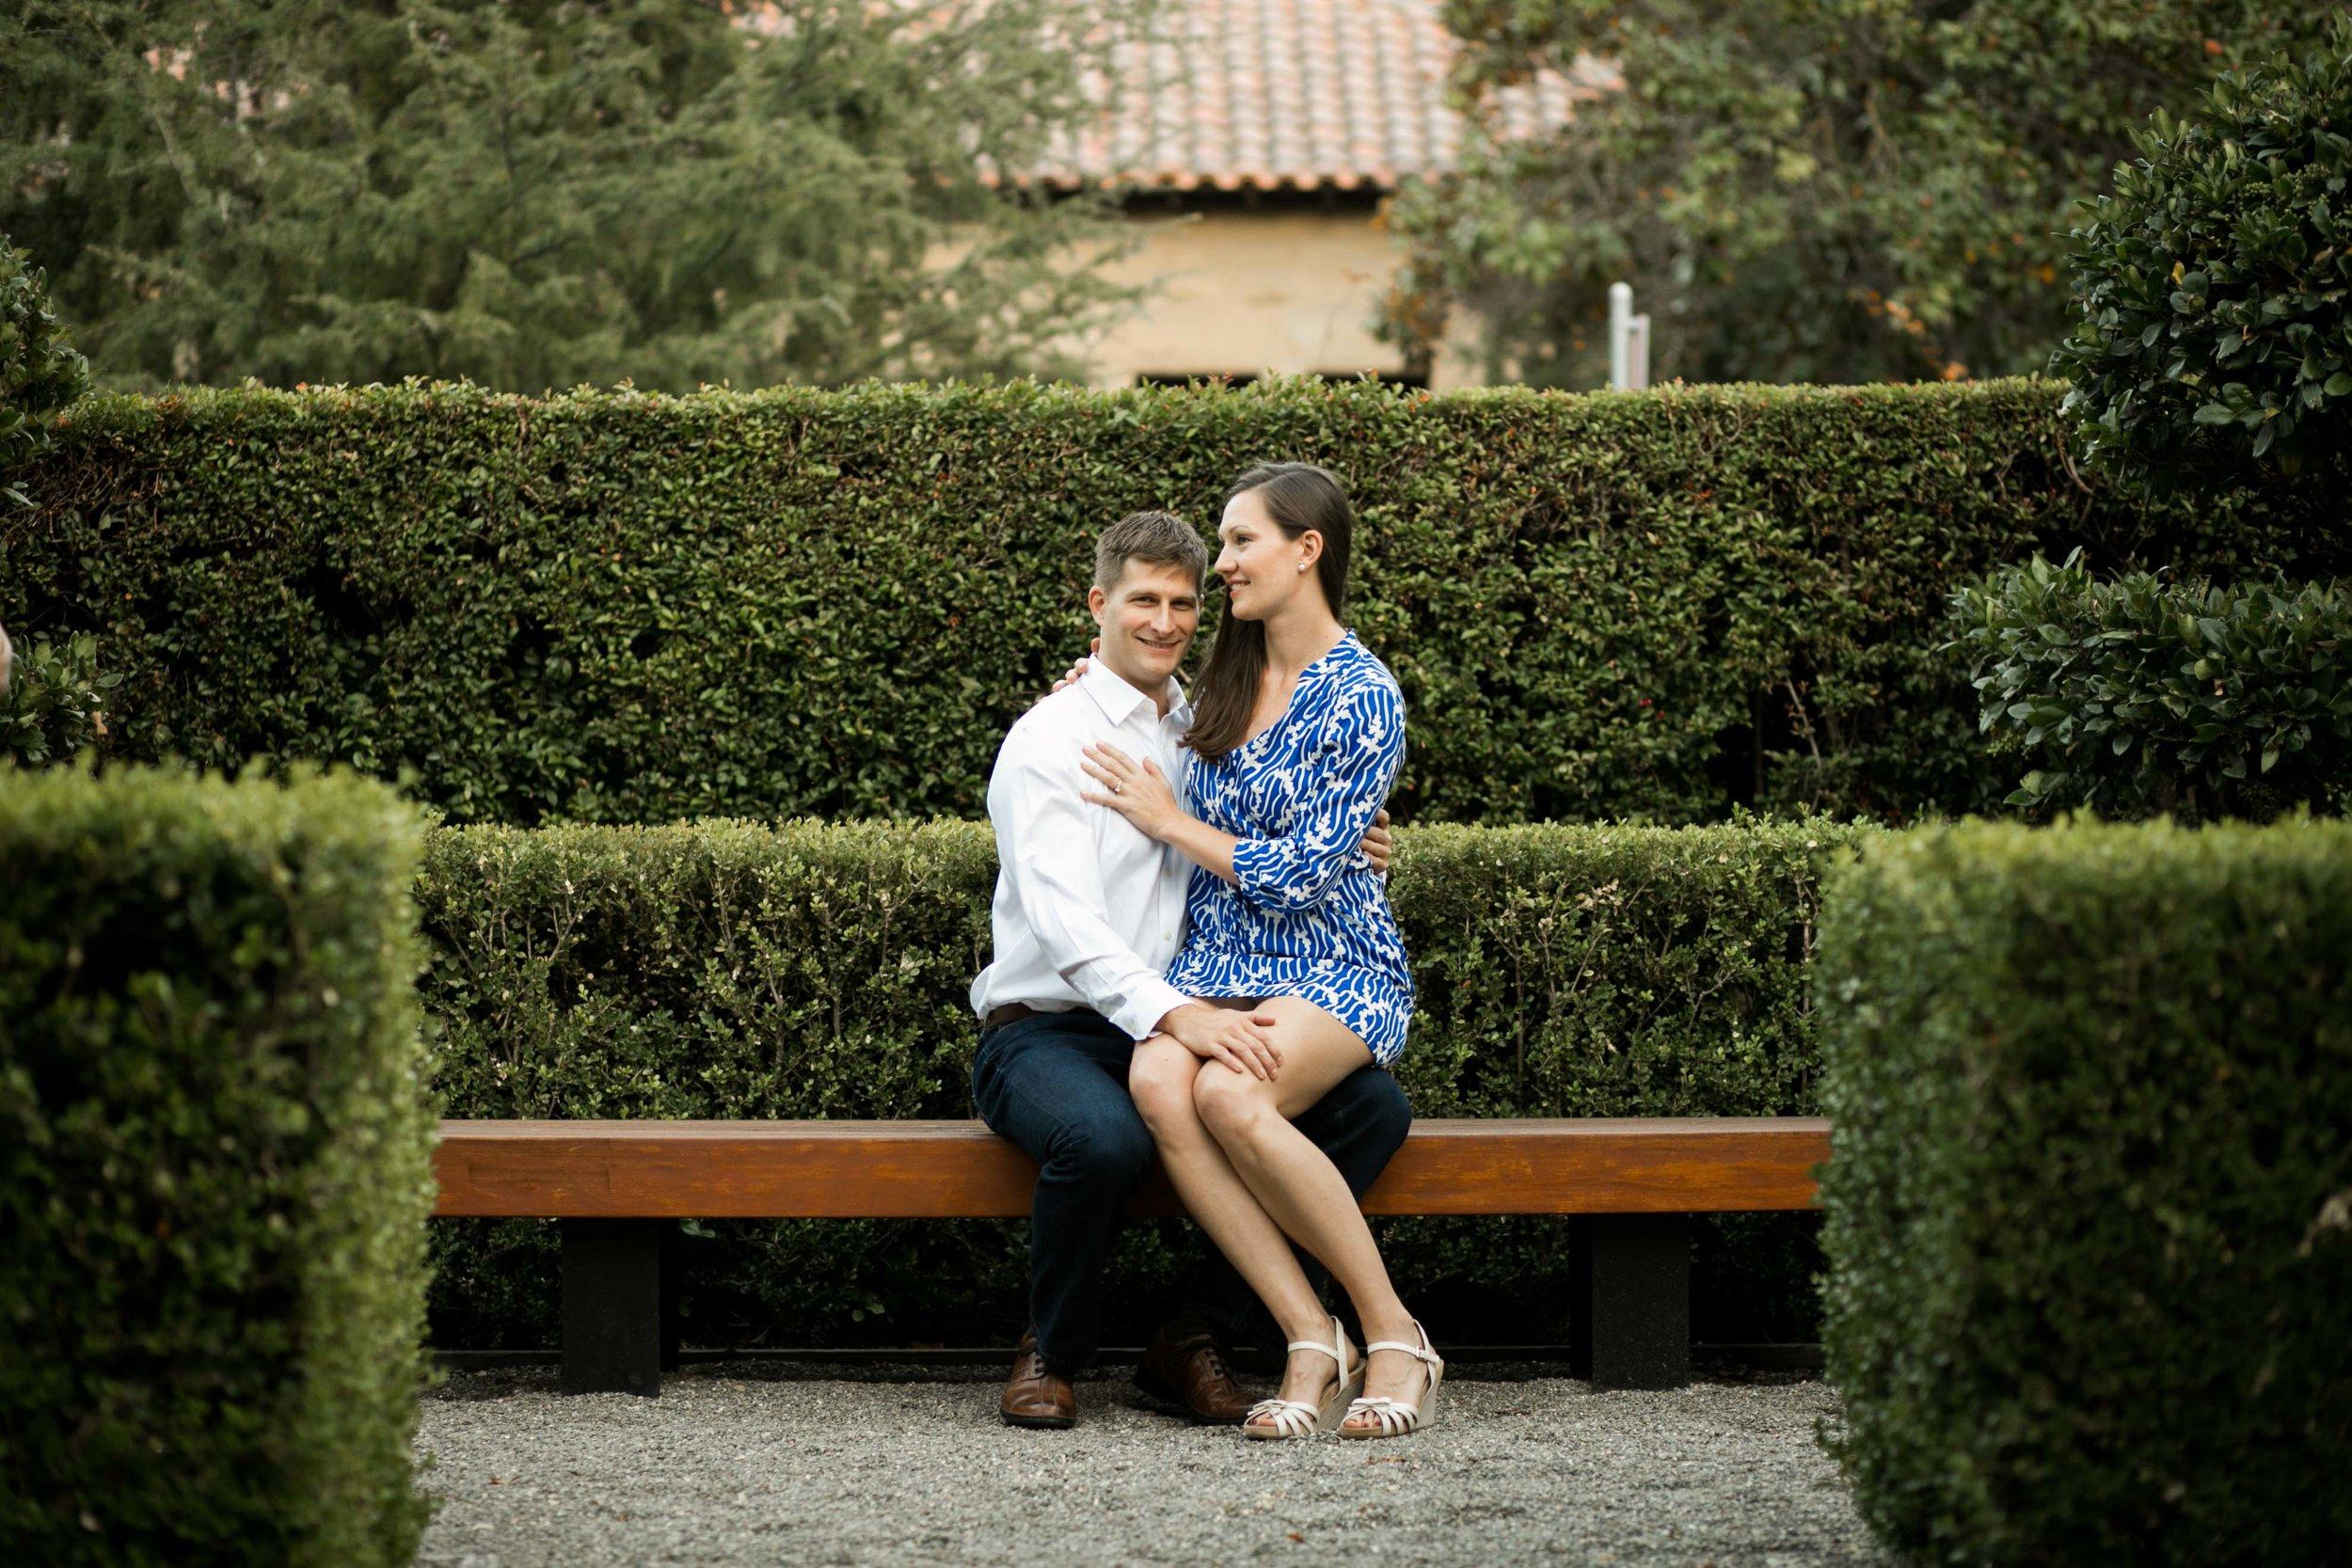 Bre Thurston Photography | San Francisco Bay Area wedding photographer | Karen and Brian's Beautiful California Engagement